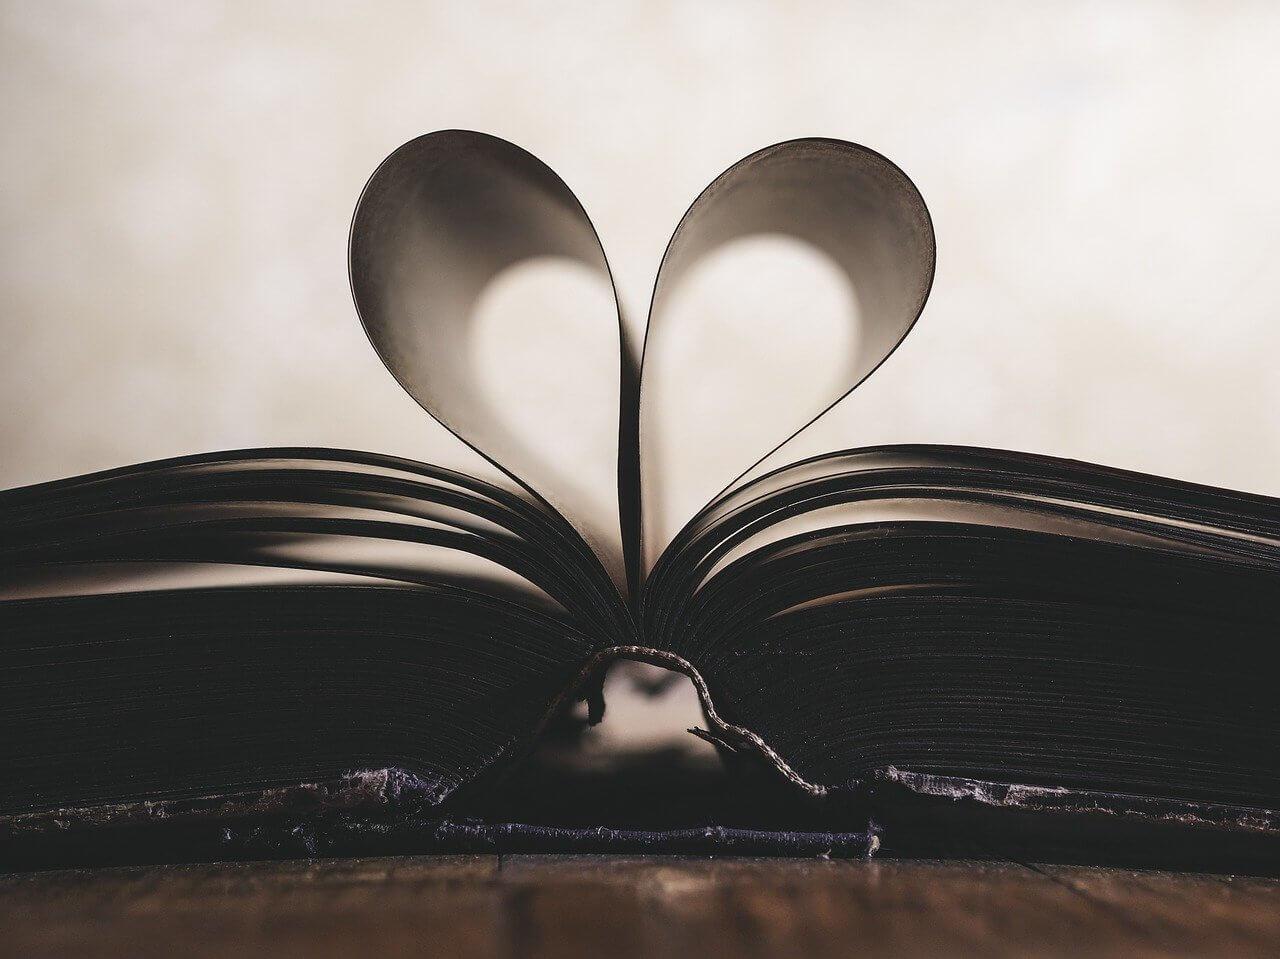 how love spells work,love spells,reputable love spells,side effects of love spells